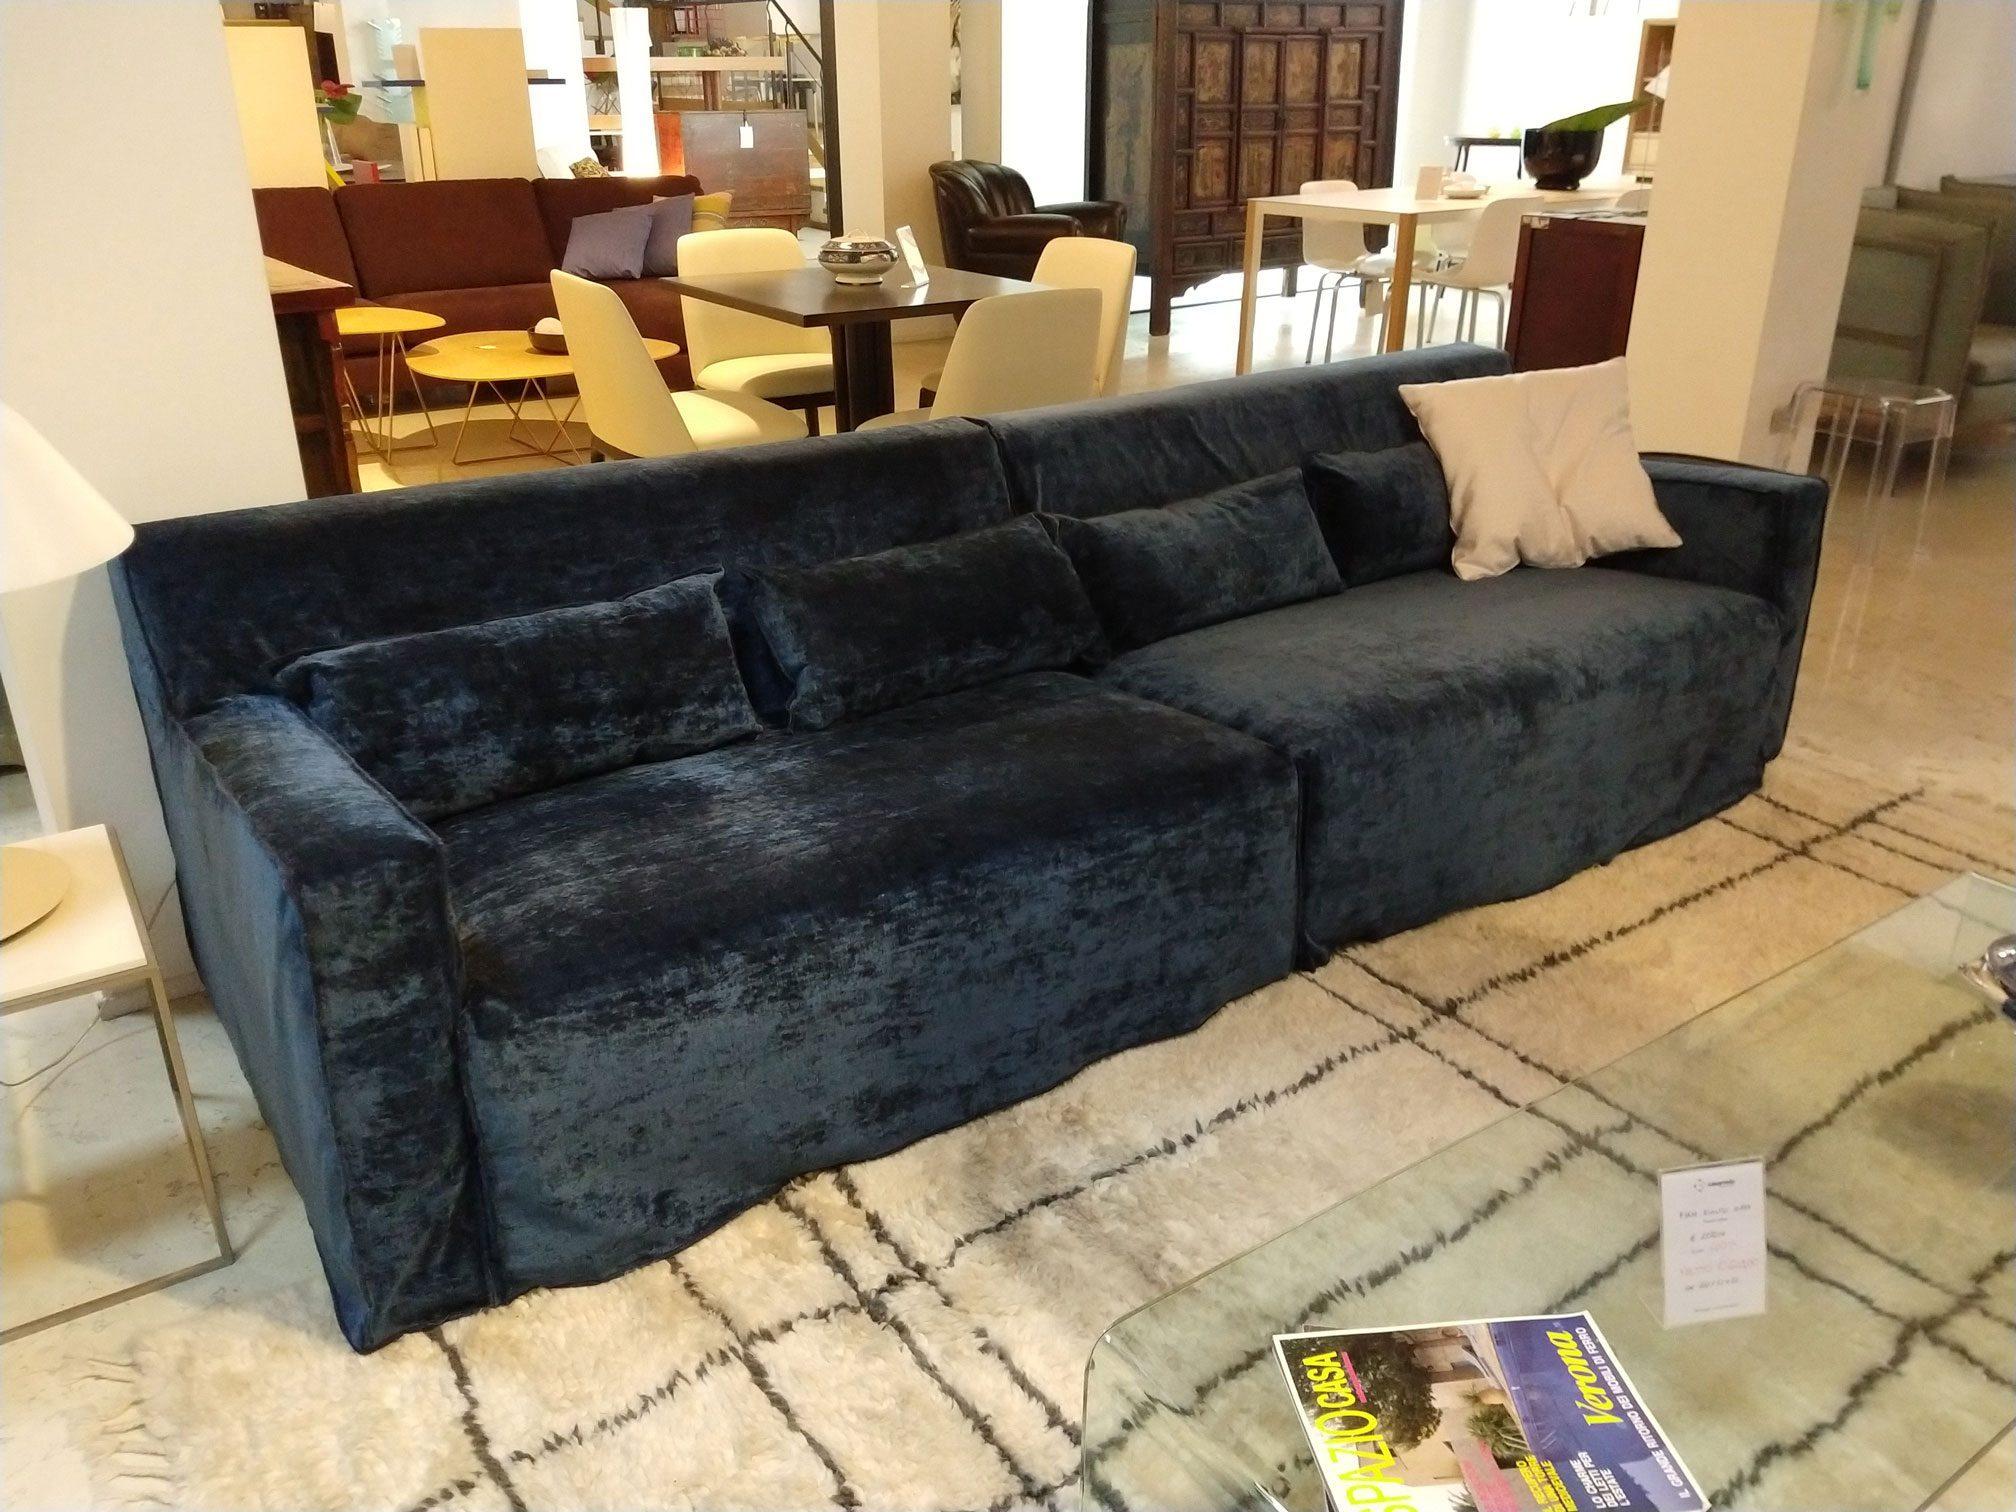 Divano In Lino Bianco : More divano cm.260 tessuto poseidone 2° rivestimento lino bianco